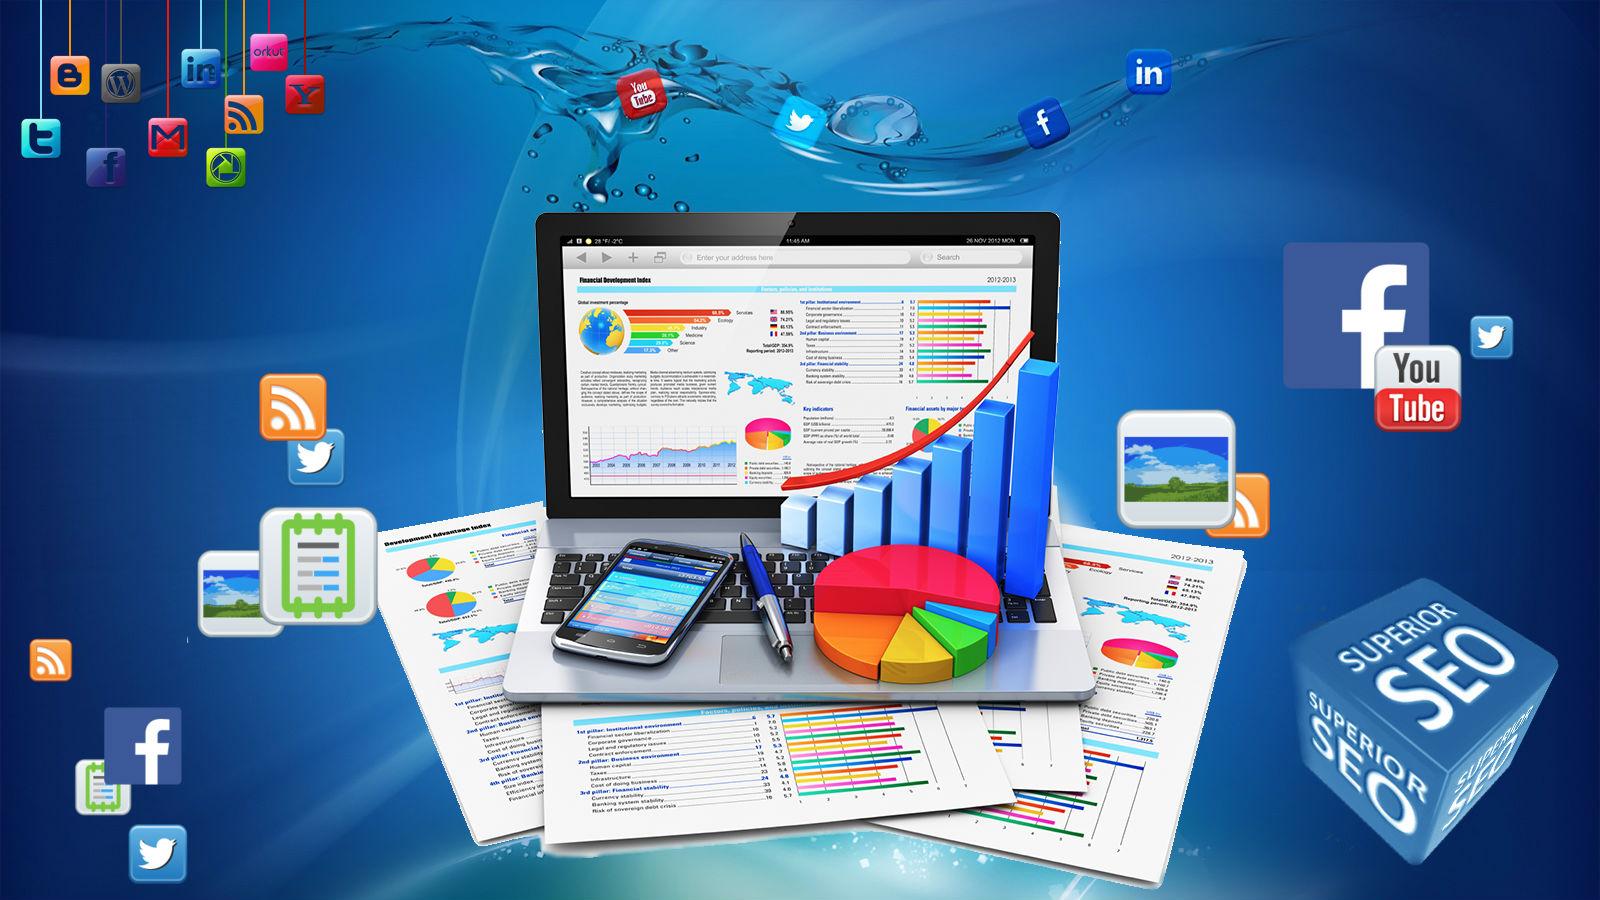 Digital Marketing Course for Beginners - Learn Digital ...